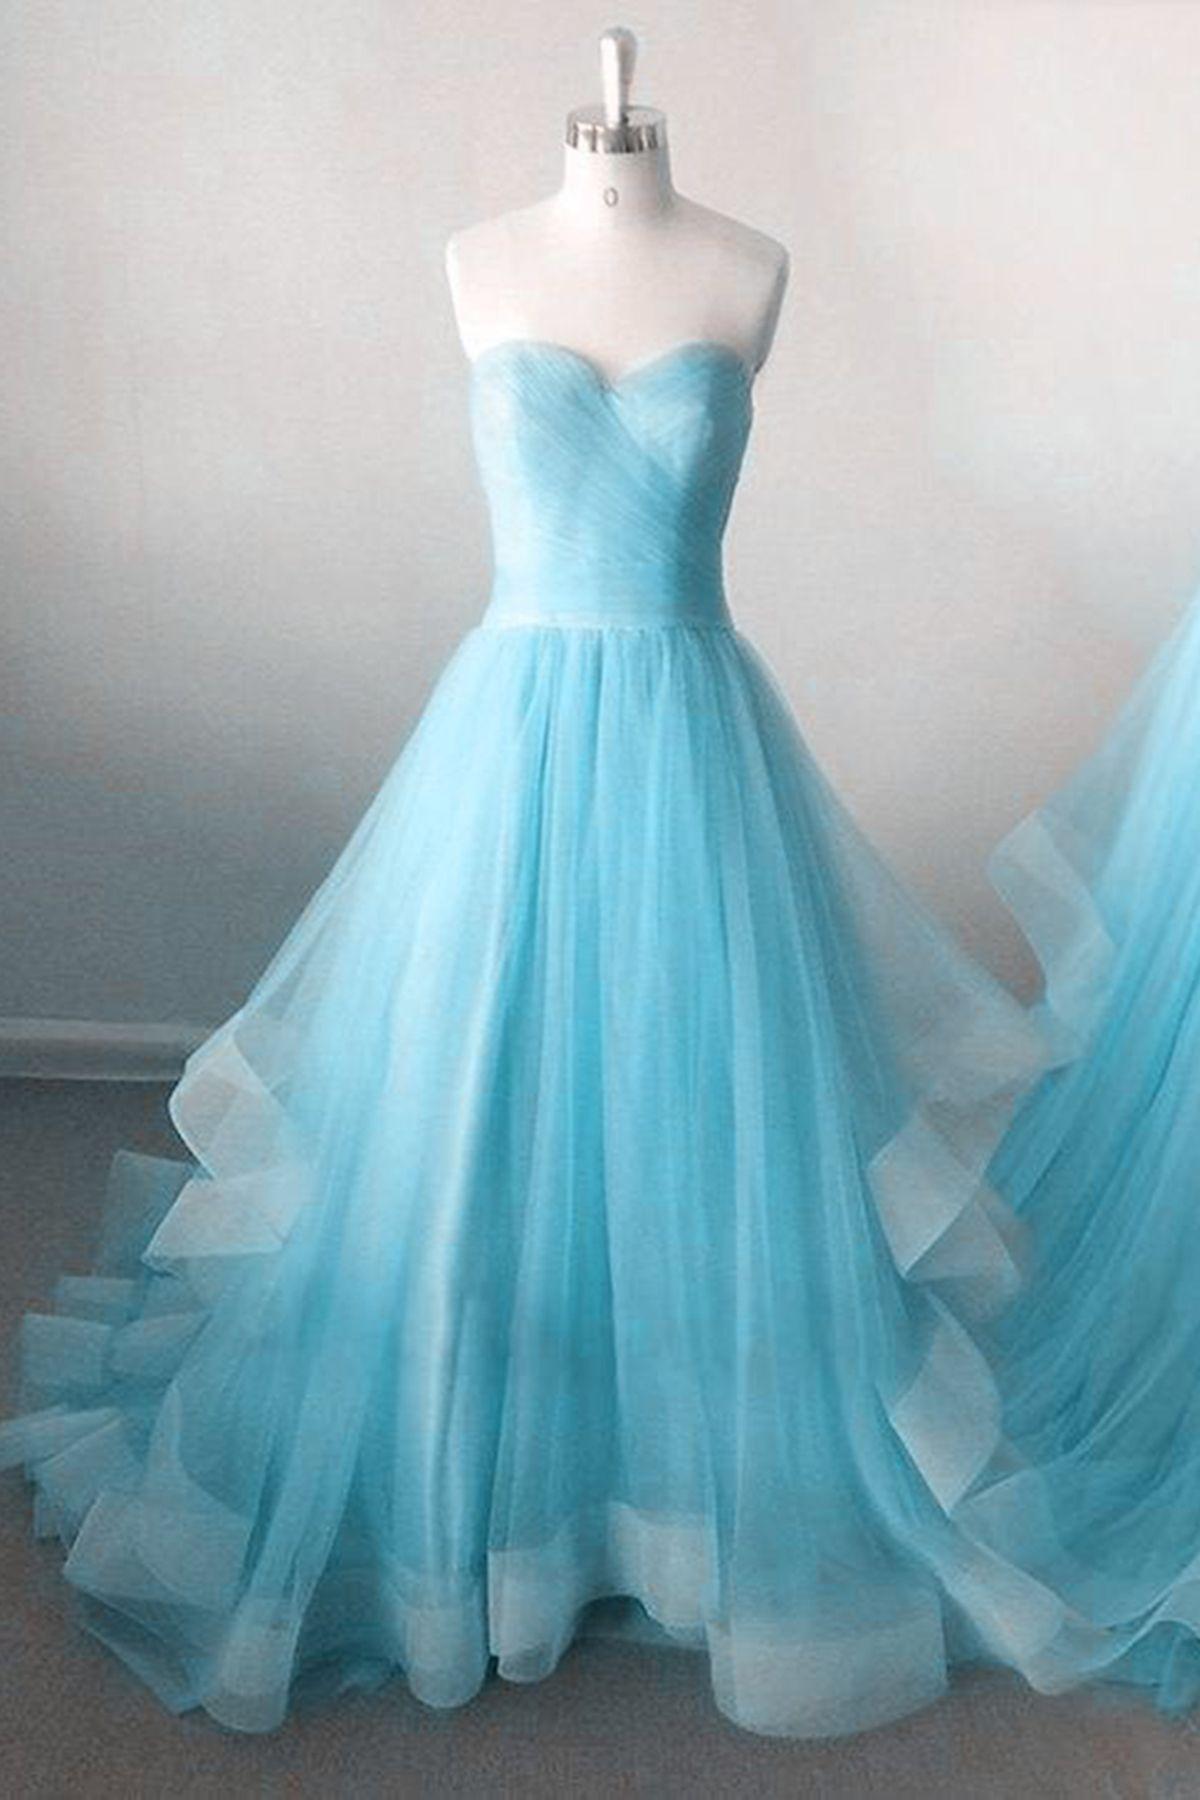 Beautiful blue tulle sweetheart dress for teens #promdress #dress ...